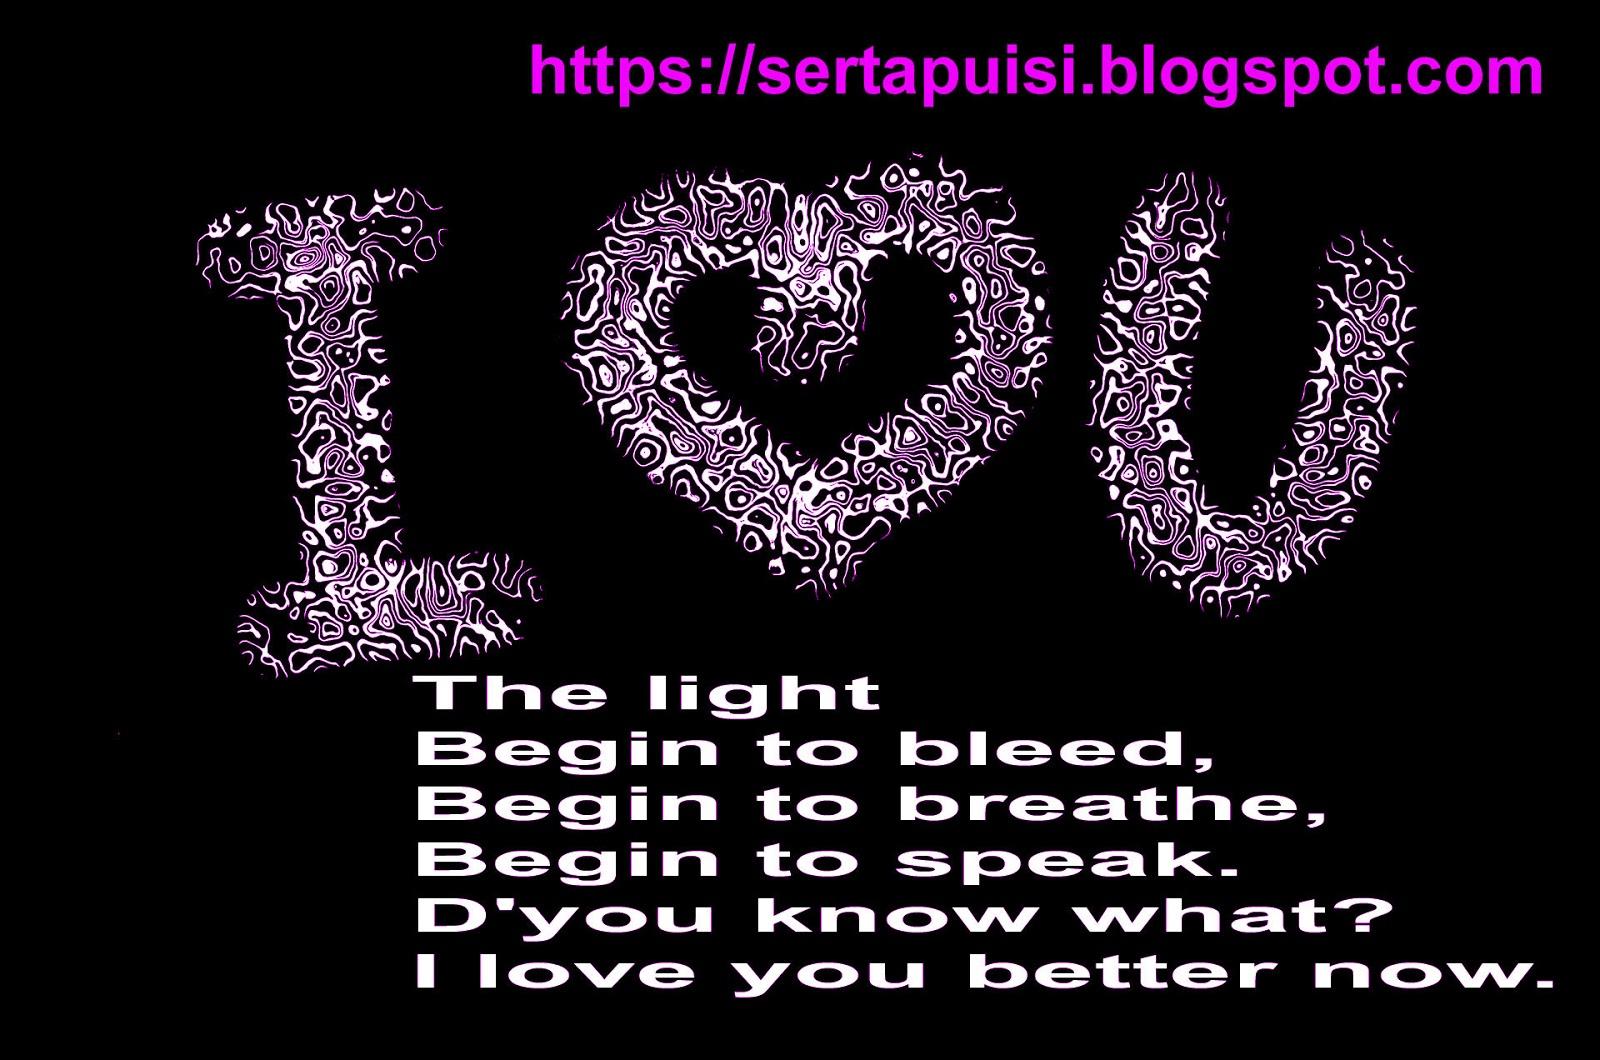 Kata Kata Cinta Galau Paling Menyentuh Buat Pacar serta